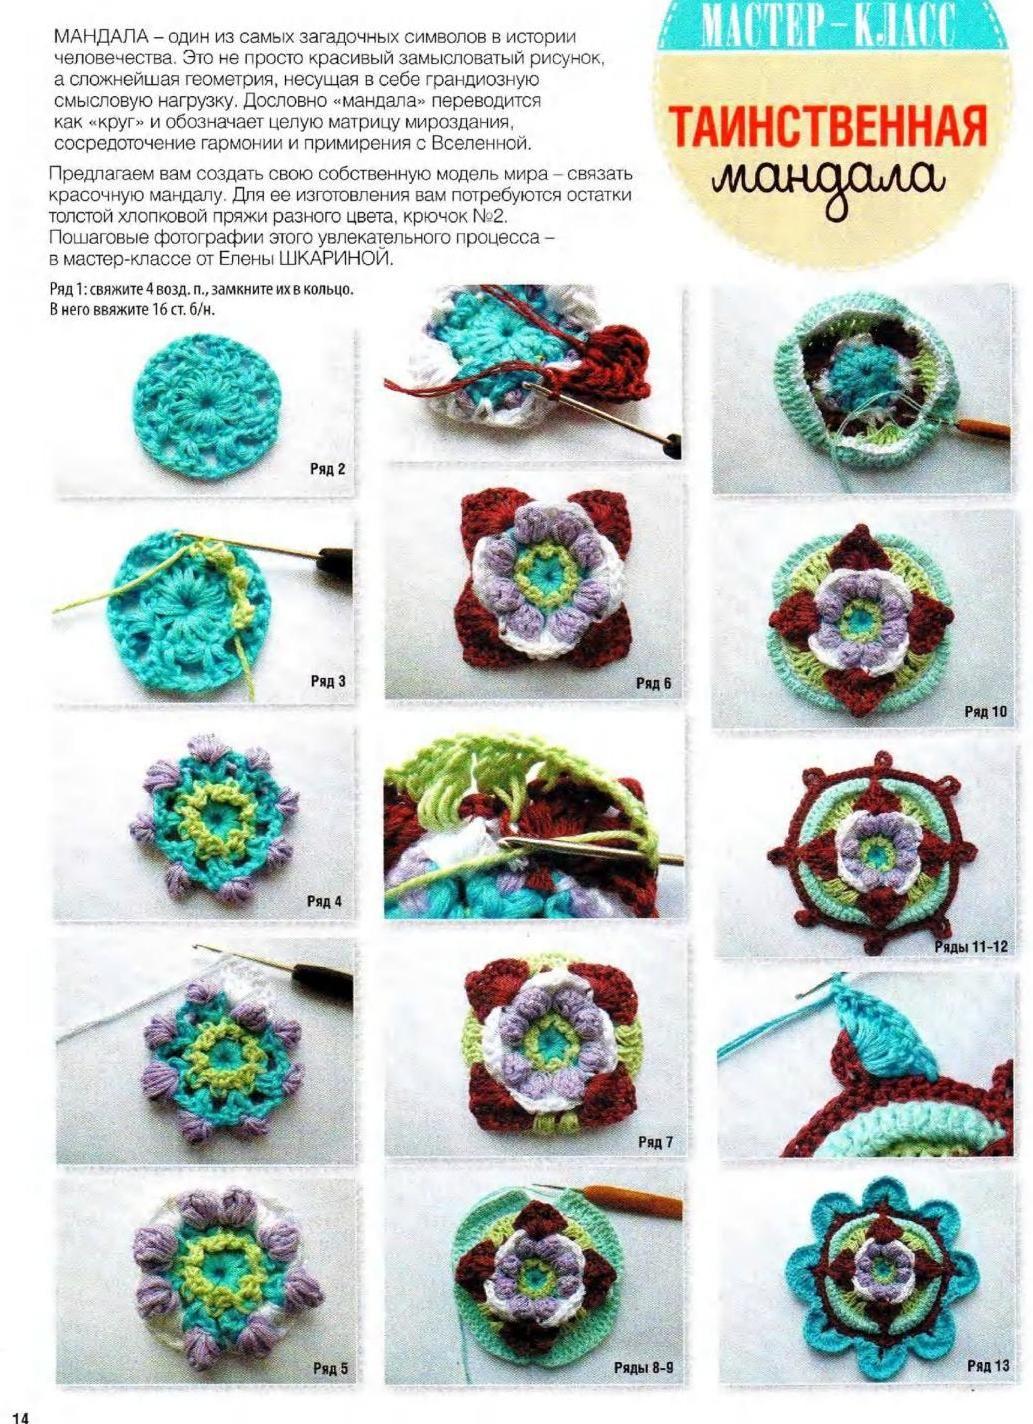 вяжем крючком 6 2016 Crochet Stitch Pattern Cable Overlay